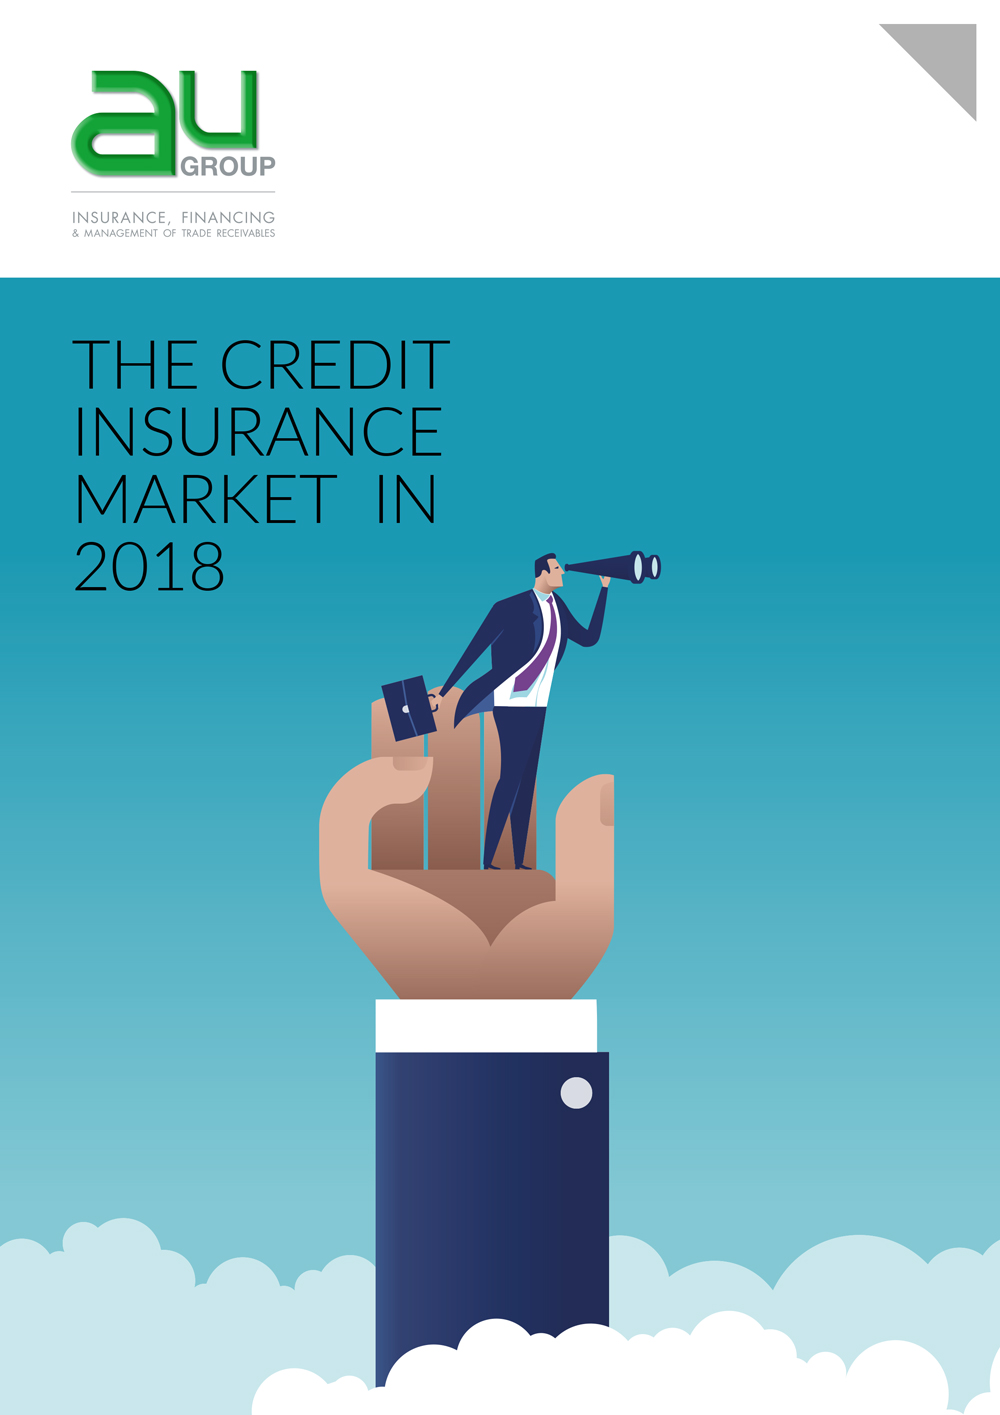 Credit Insurance Market in 2018